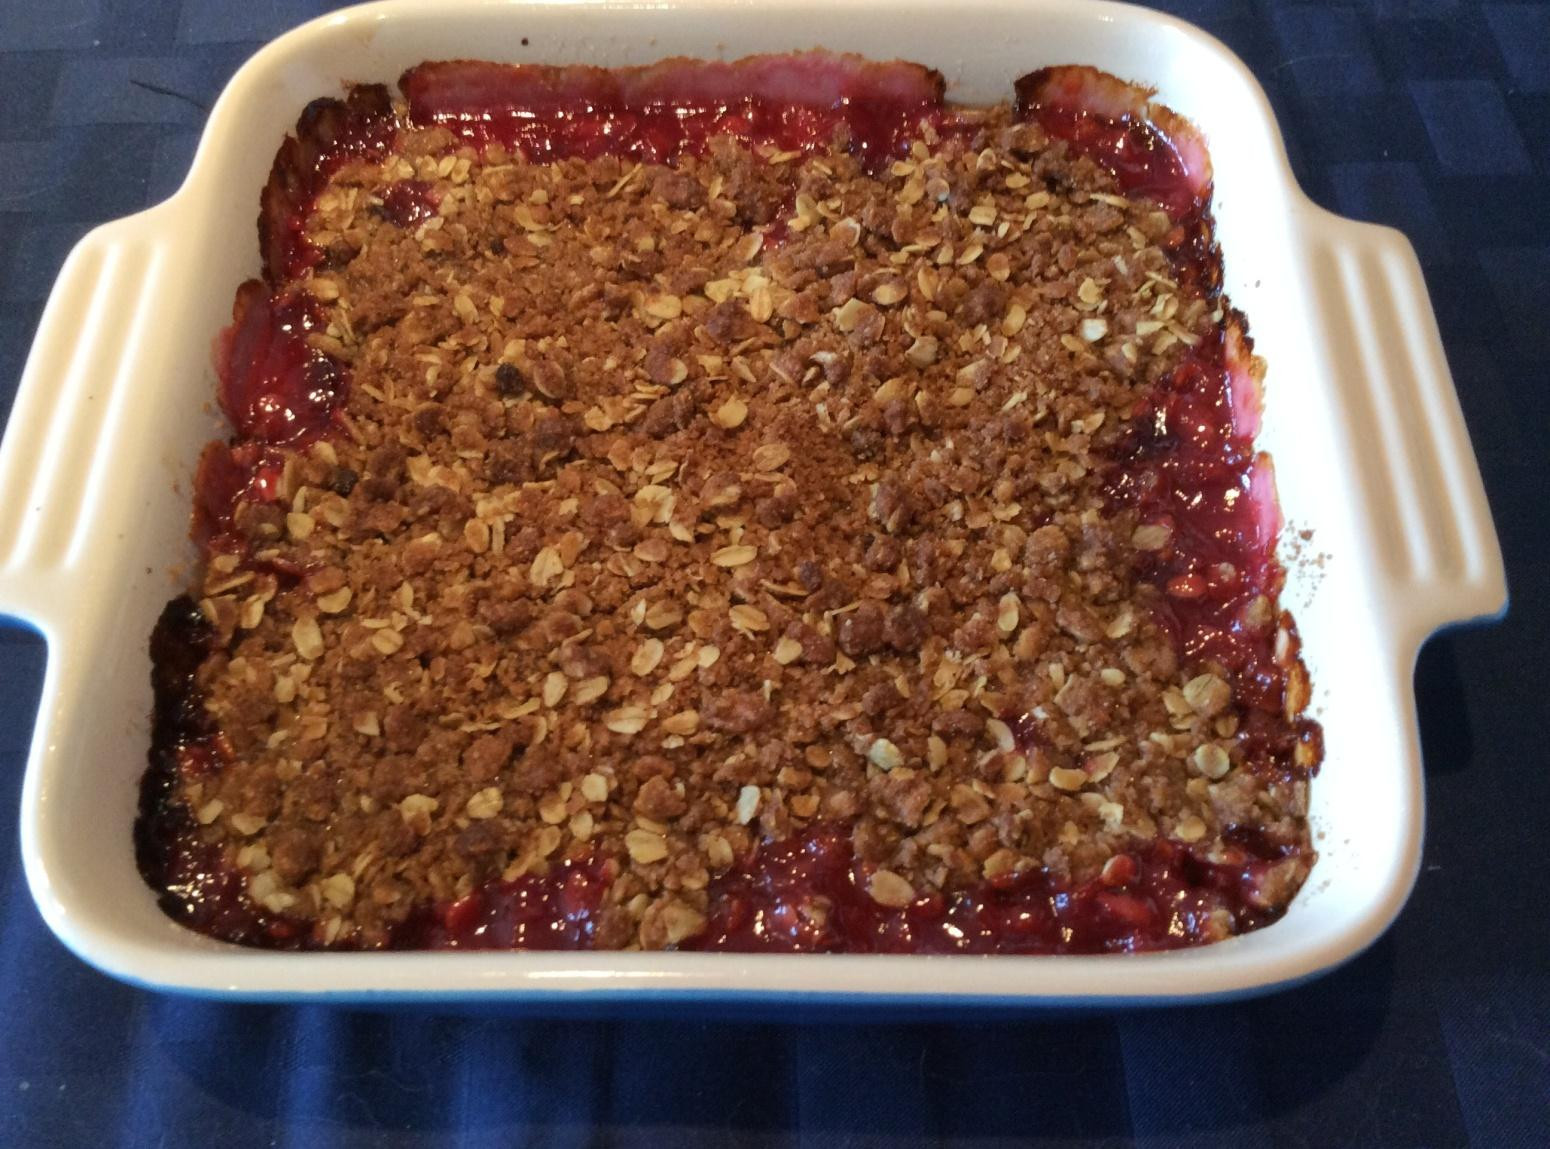 Oatmeal Dessert Recipes  Rhubarb Oatmeal Crisp Dessert Recipe